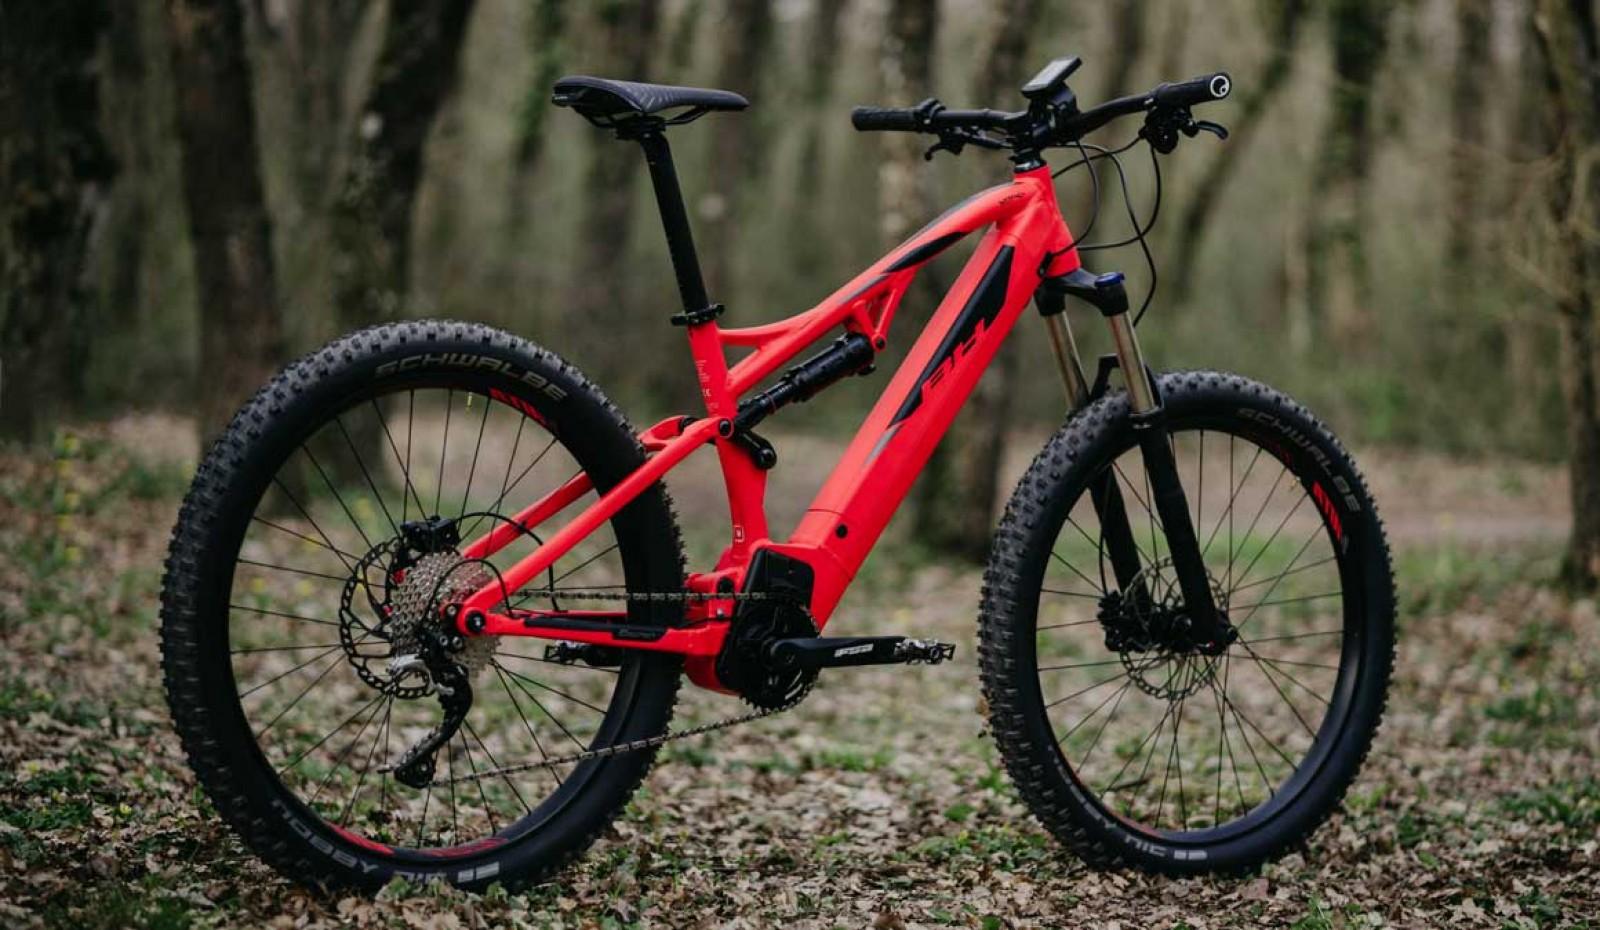 terminologia-e-bike/